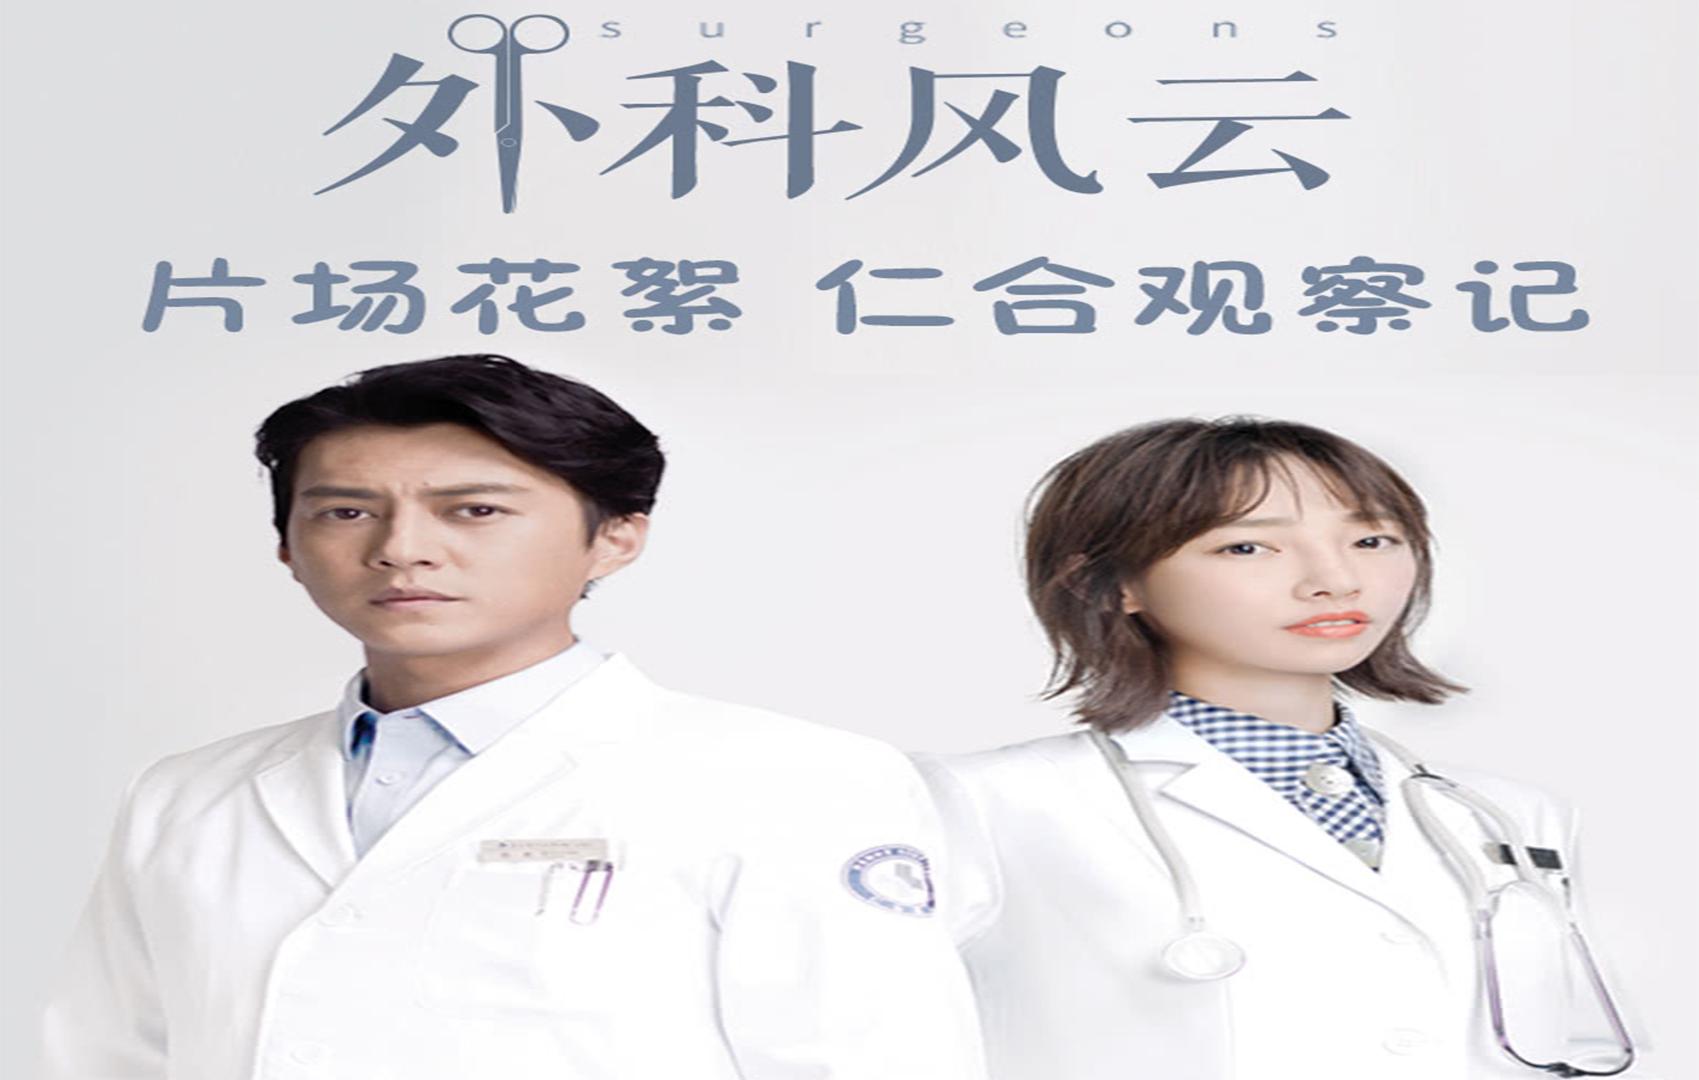 مسلسل Surgeons مترجم